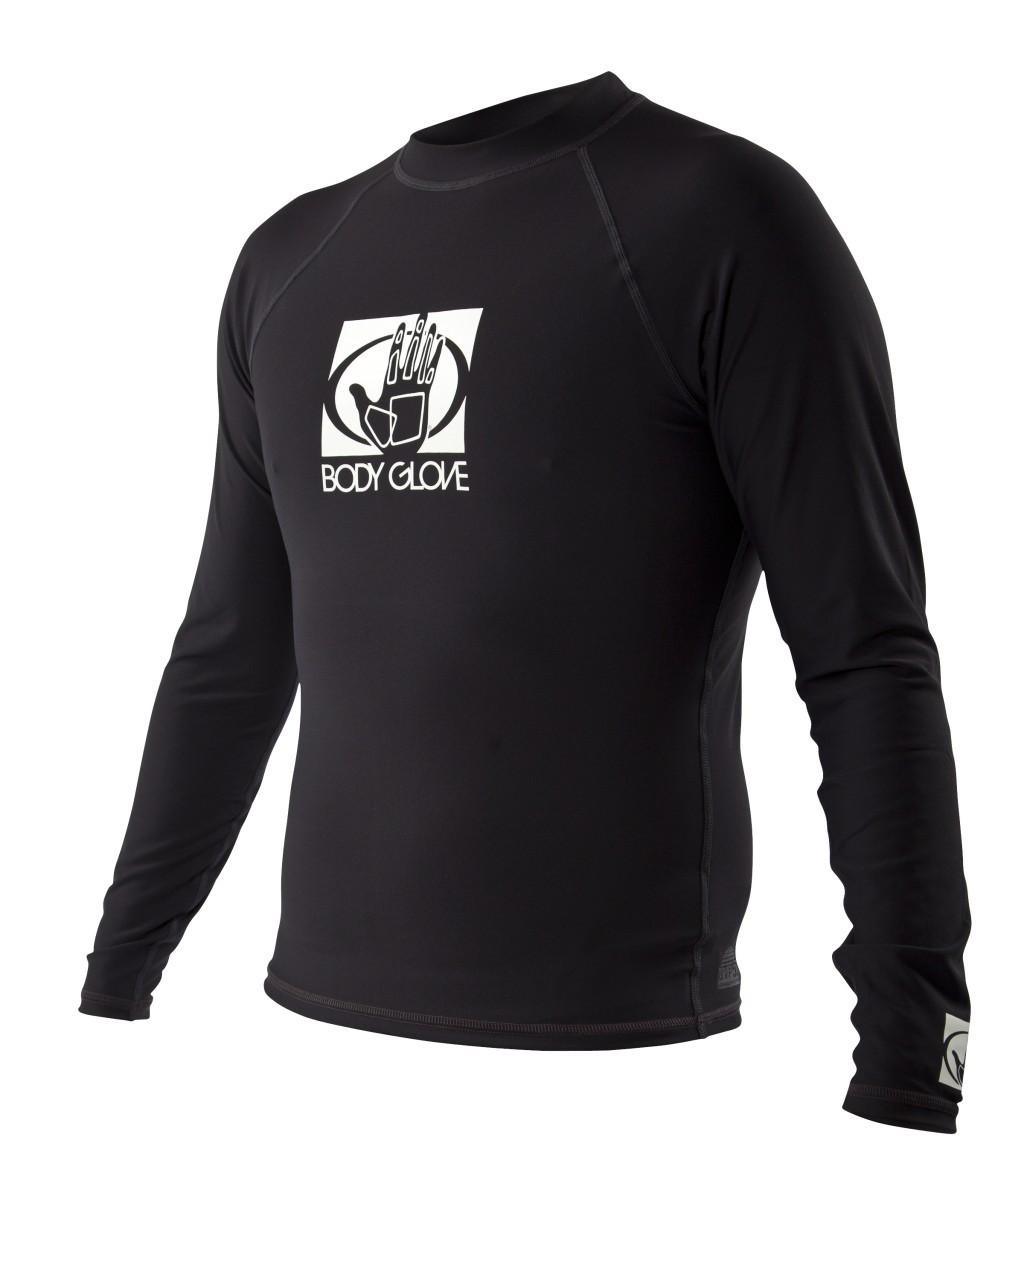 BodyGlove Basic LS Rashguard 2XL Black